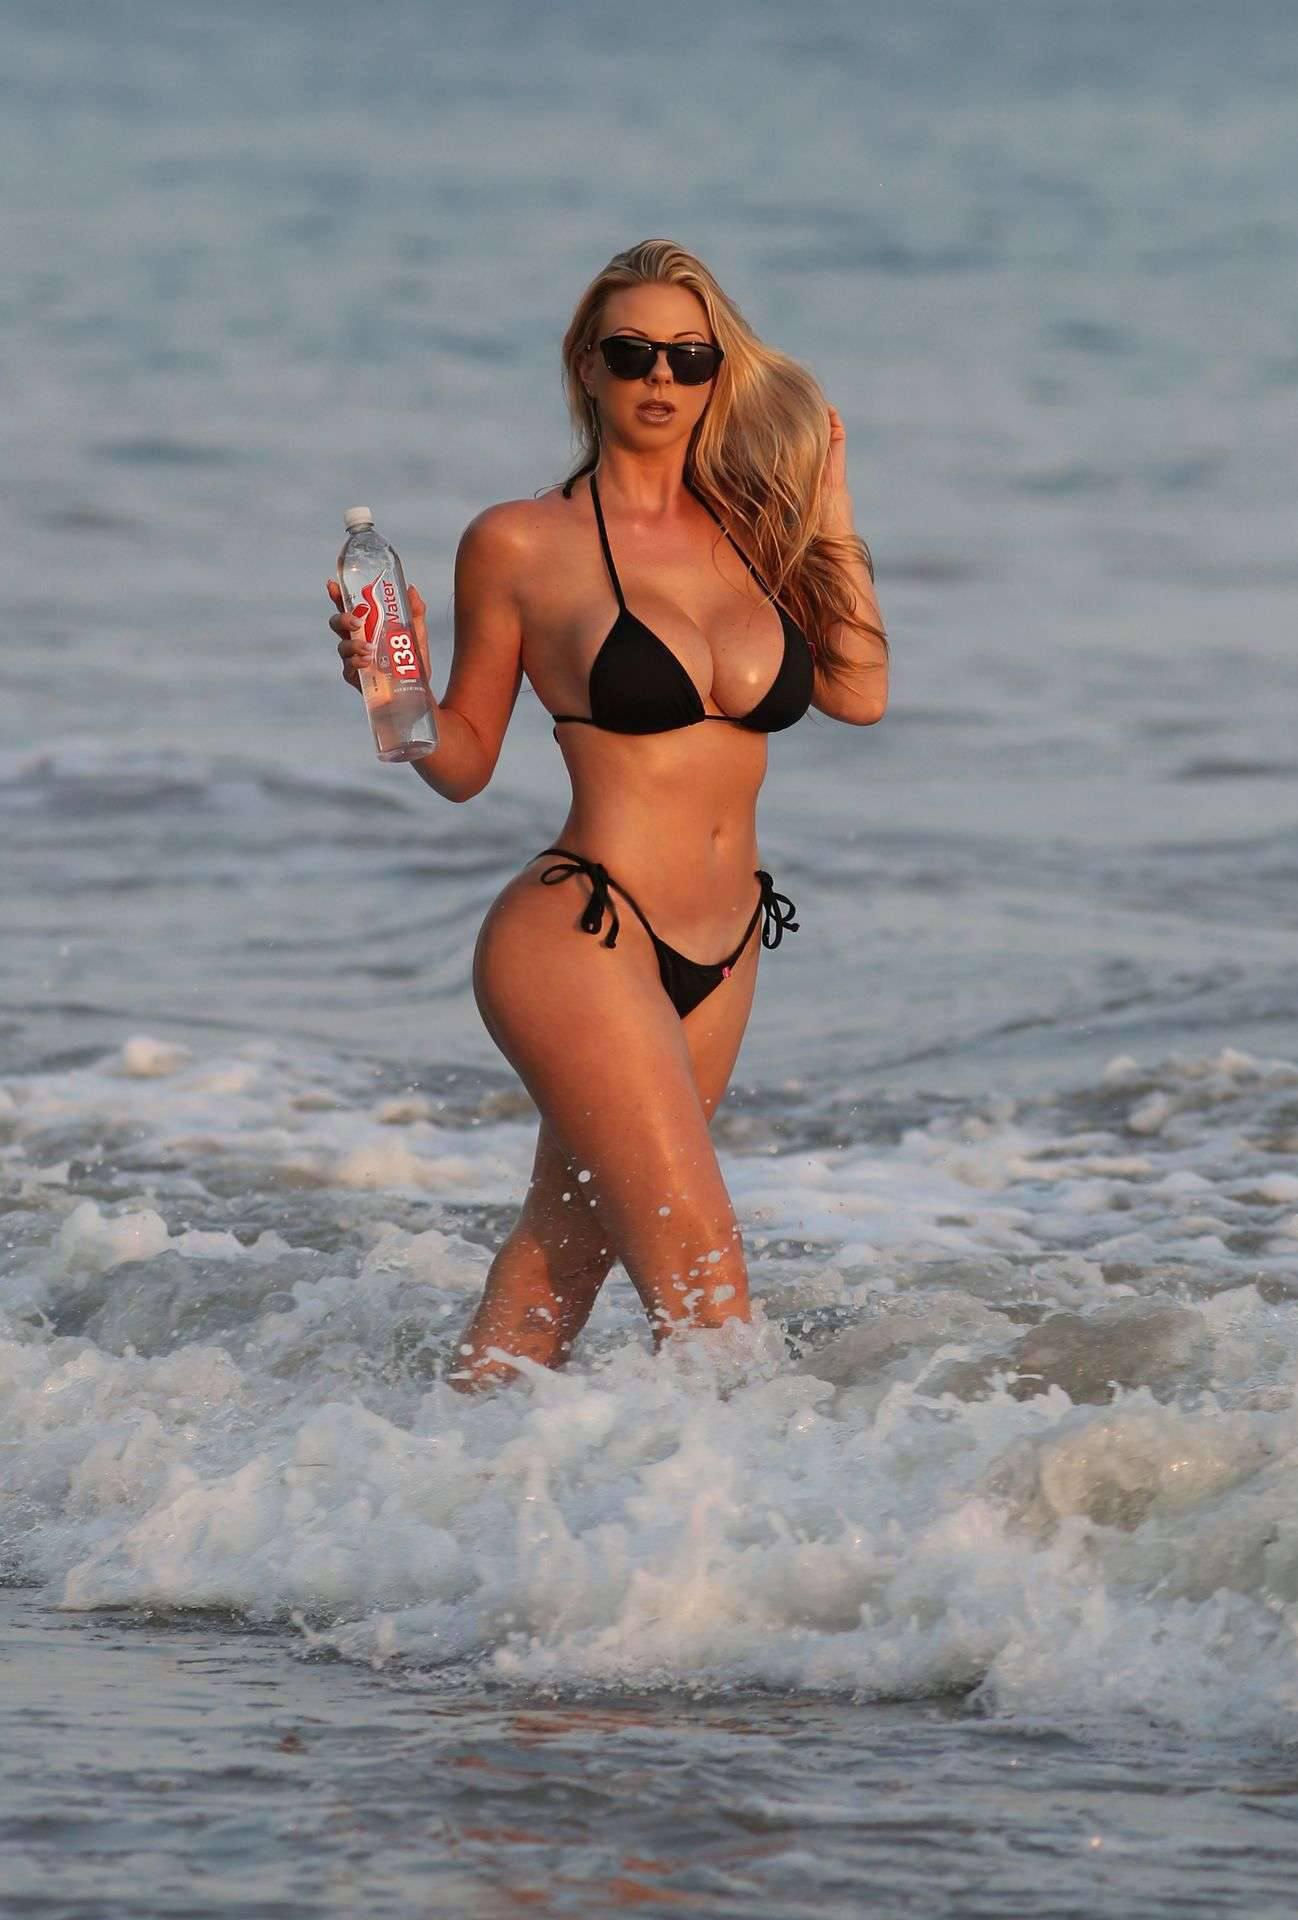 Elke Hanschke Boobs In Bikini